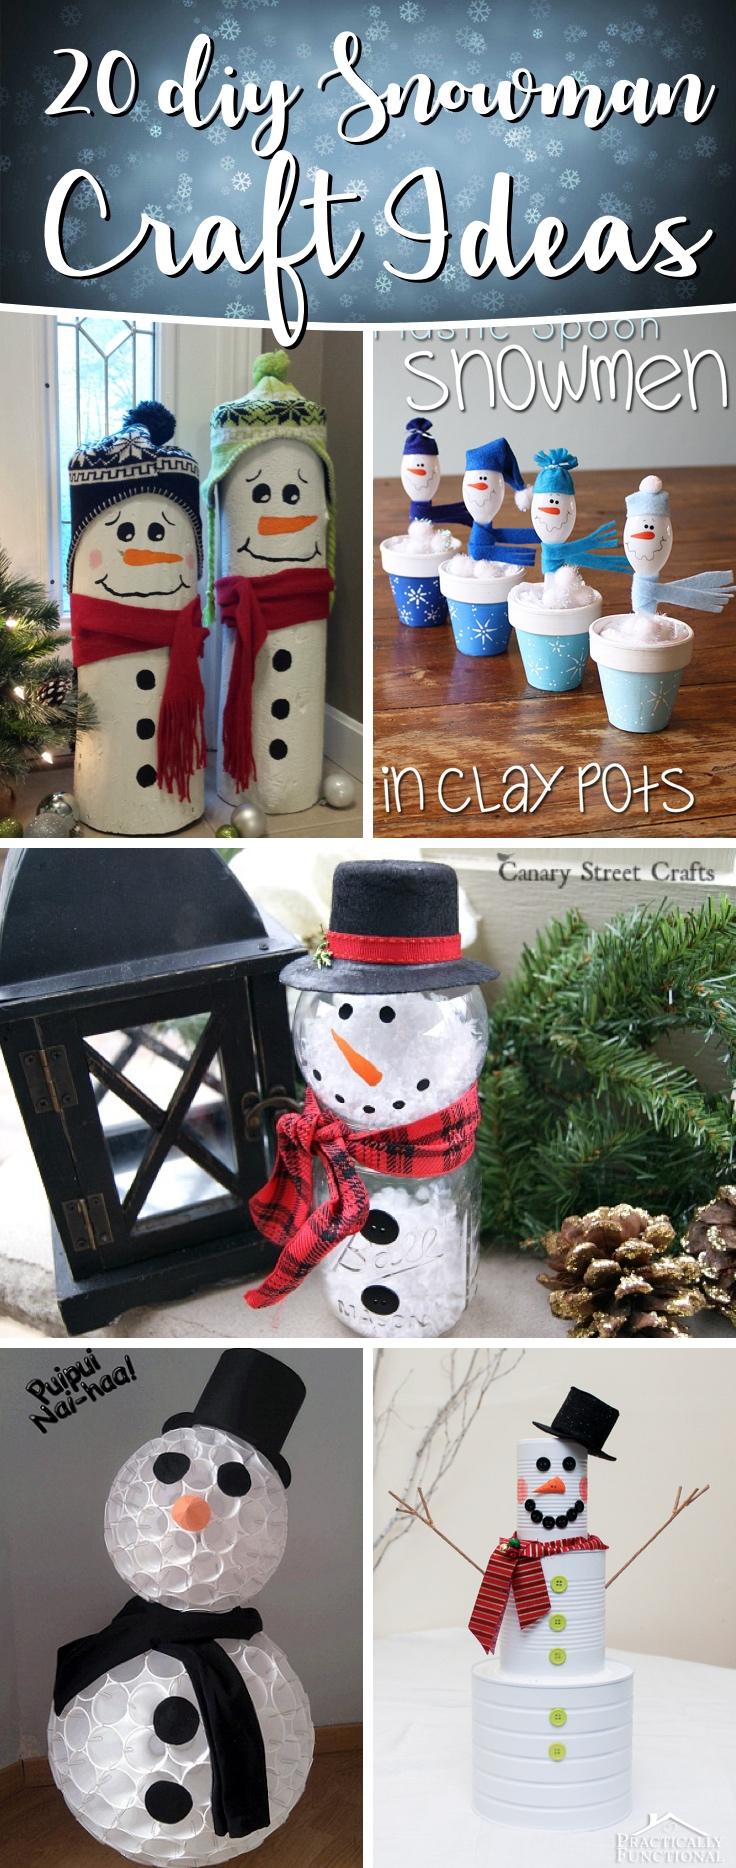 20 Diy Snowman Craft Ideas Making Christmas Even More